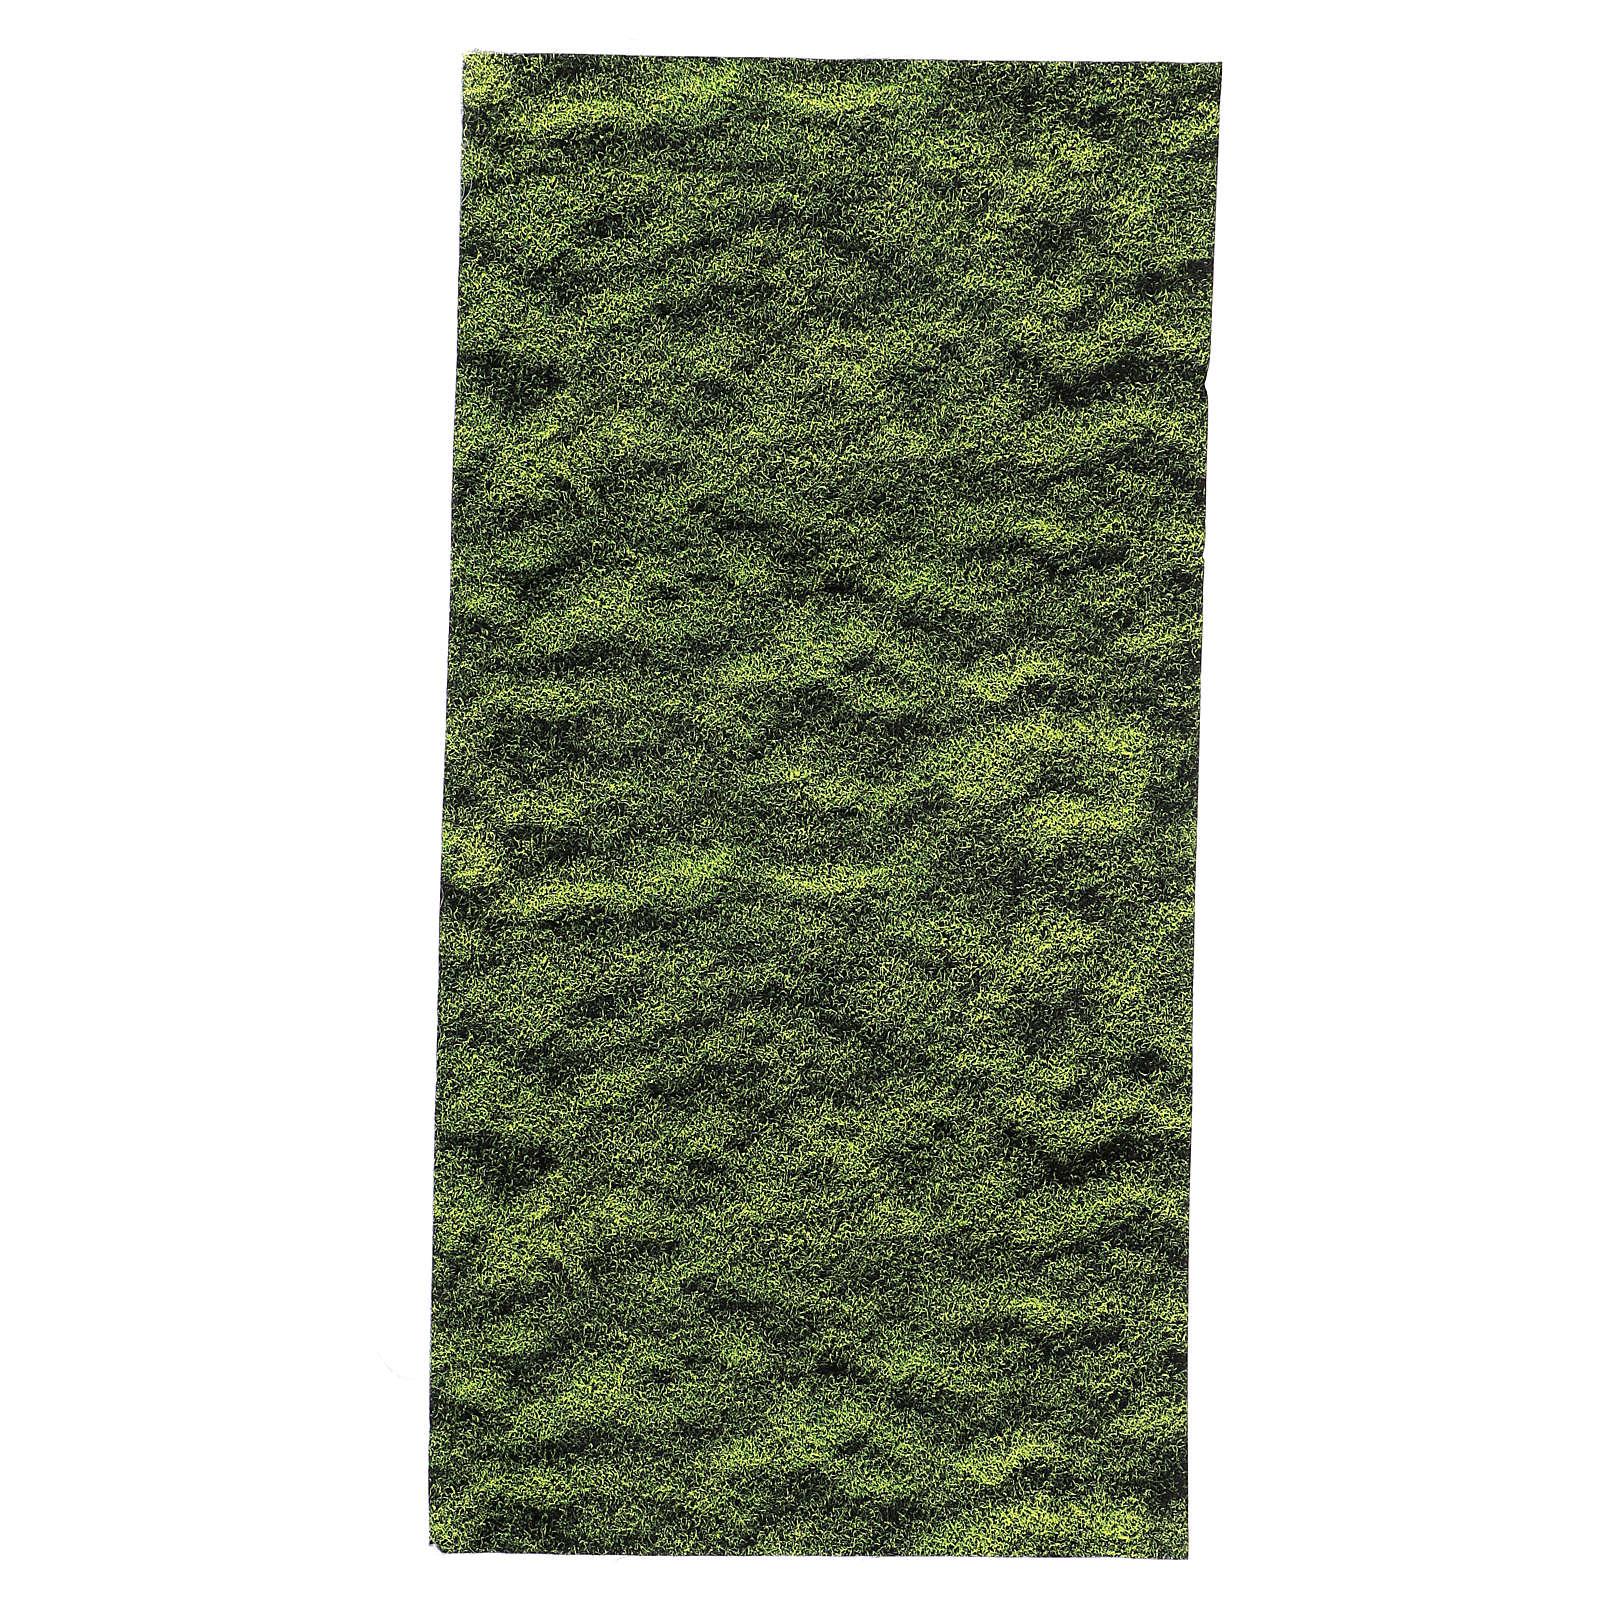 Papel musgo belén 60x30 cm modelable 4